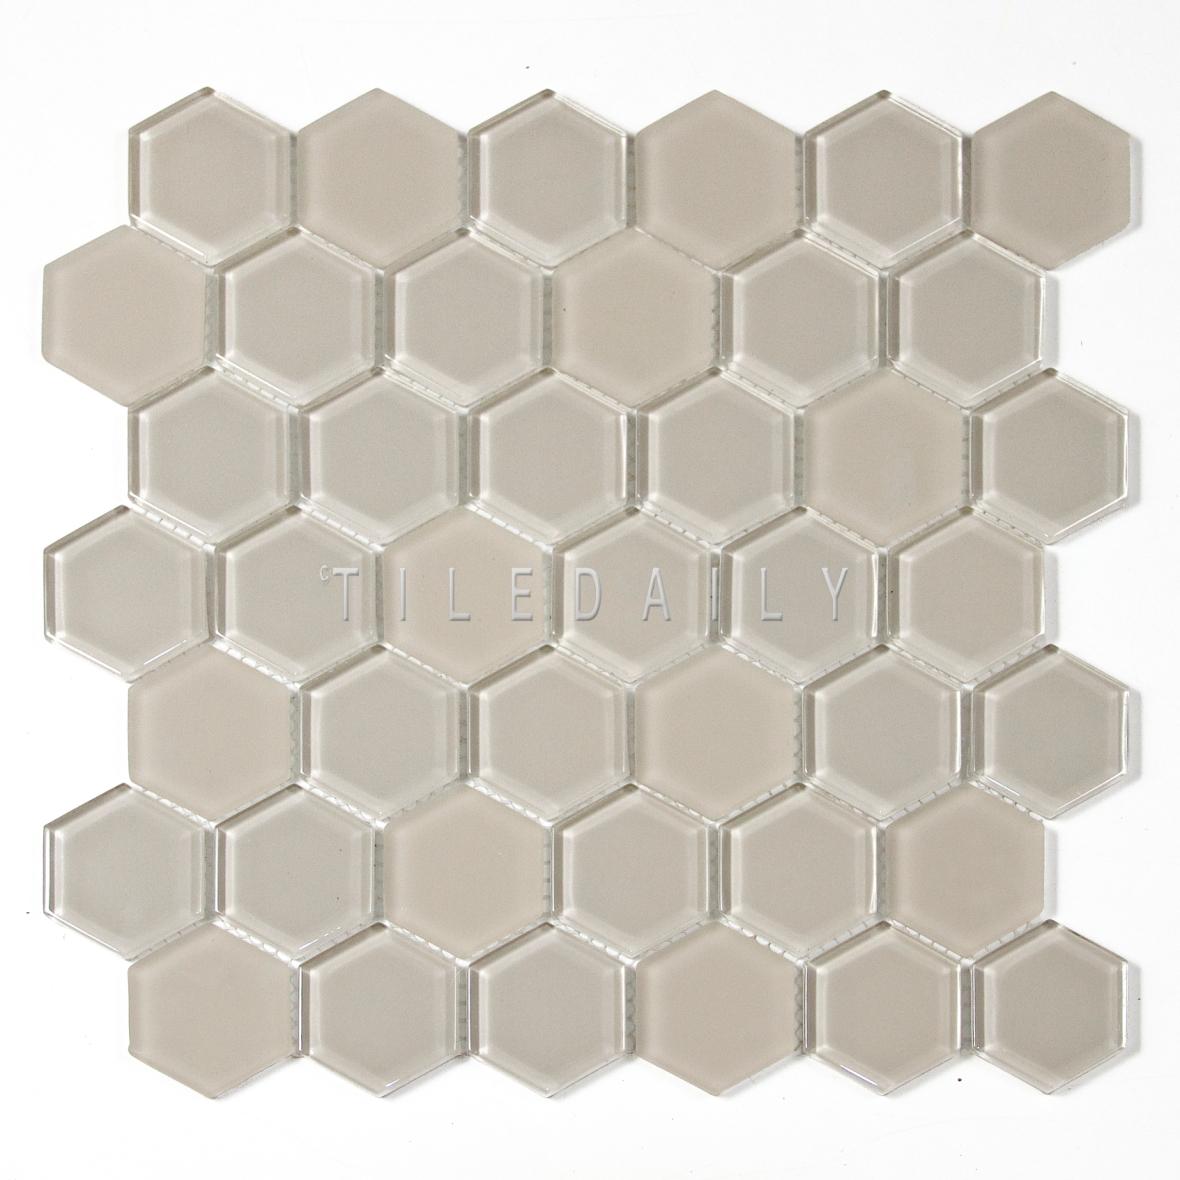 GM013LBG - 2 Hexagon Glass Mosaic, Sand